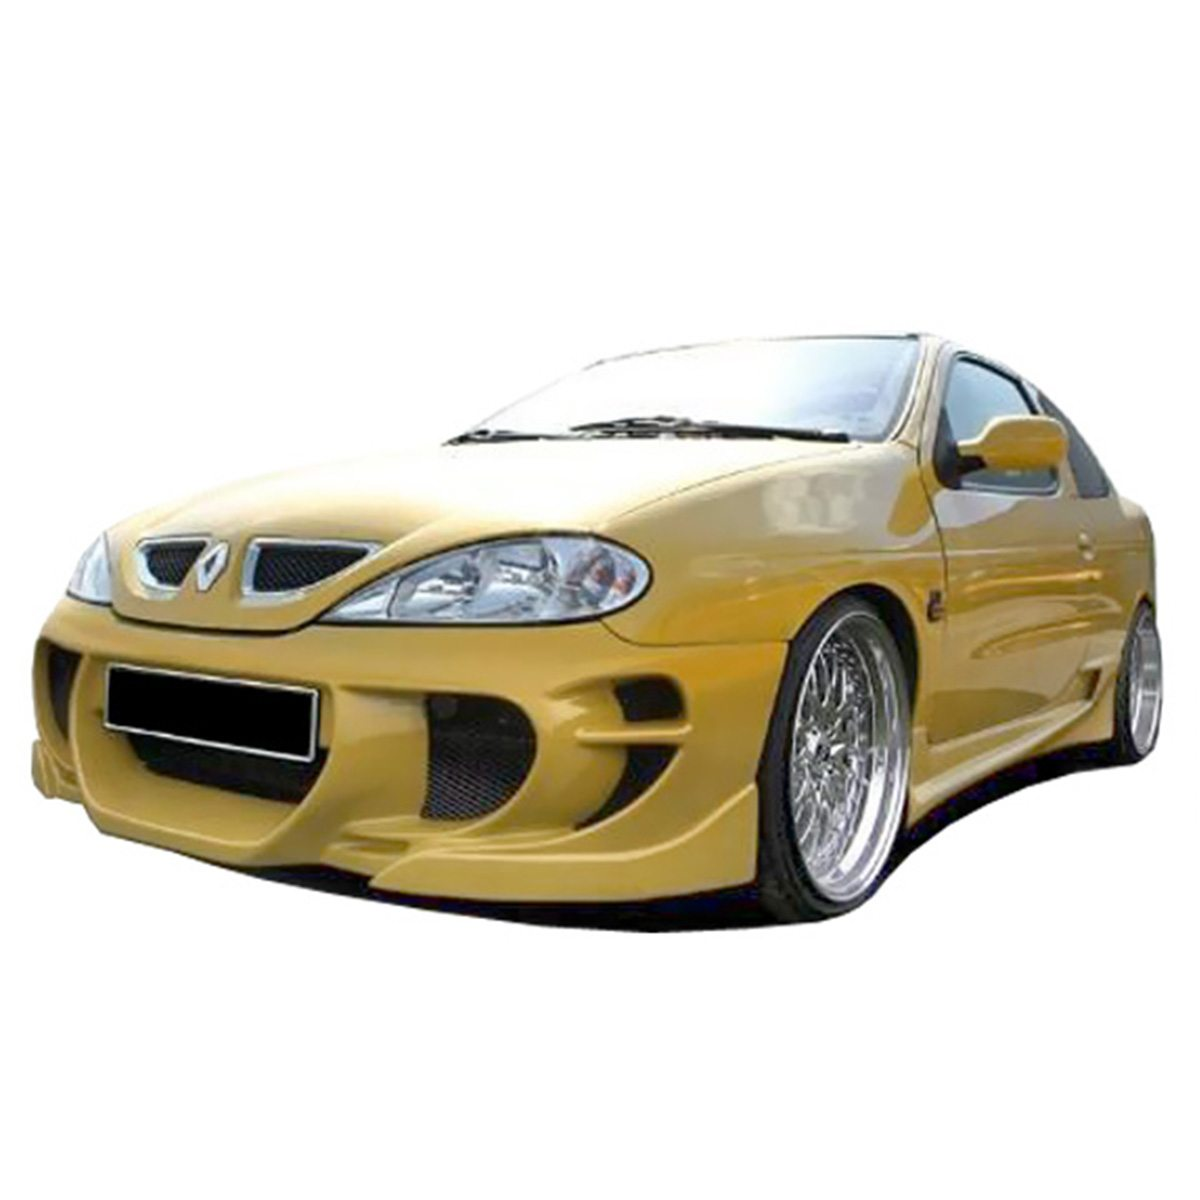 Renault-Megane-95-Frt-Xtreme-PCN097